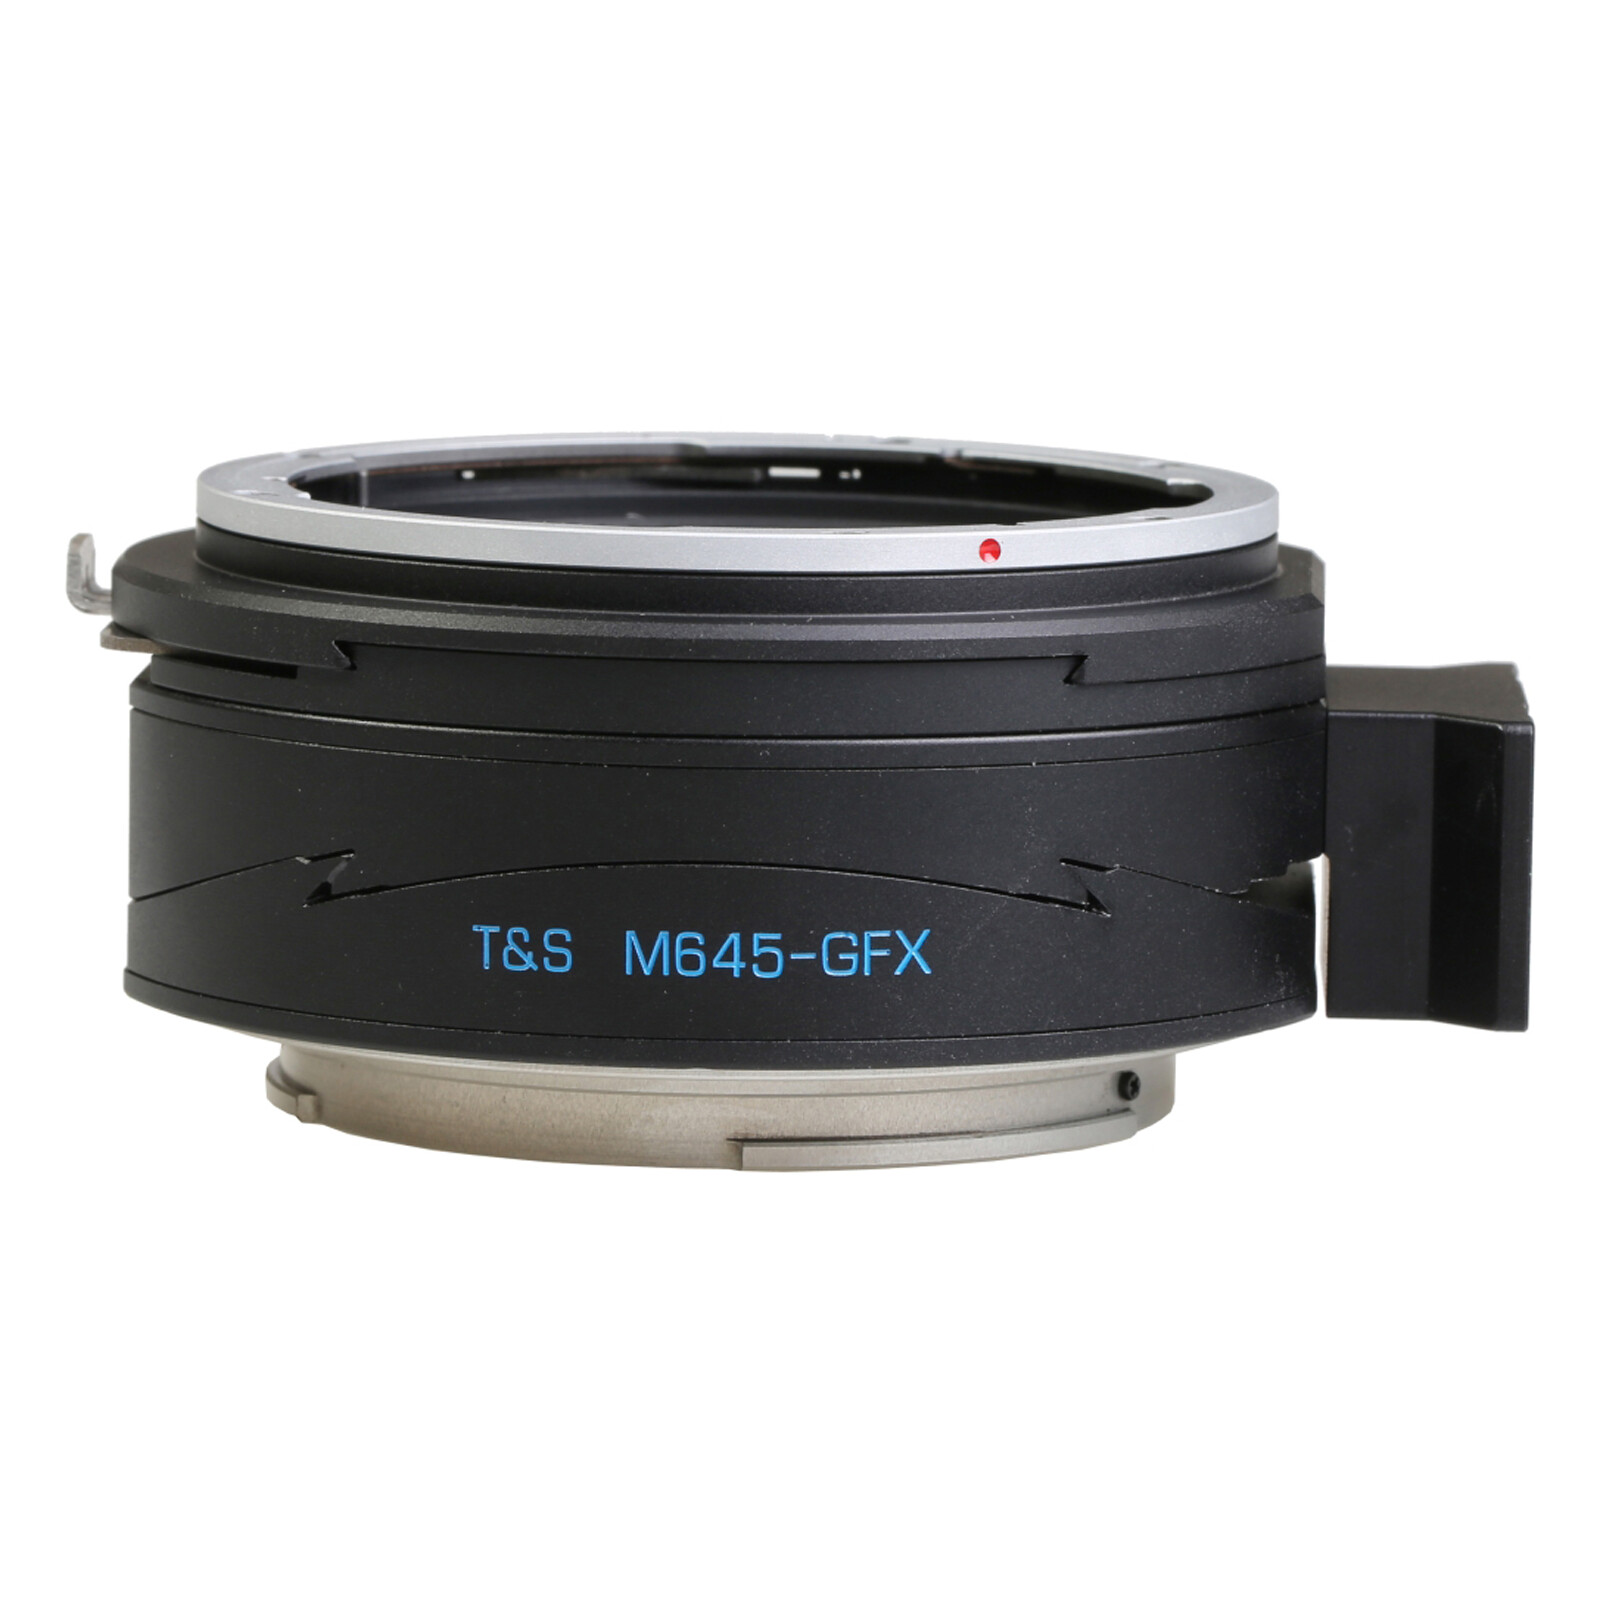 Kipon Pro T-S Adapter für Mamiya 645 auf Fuji GFX